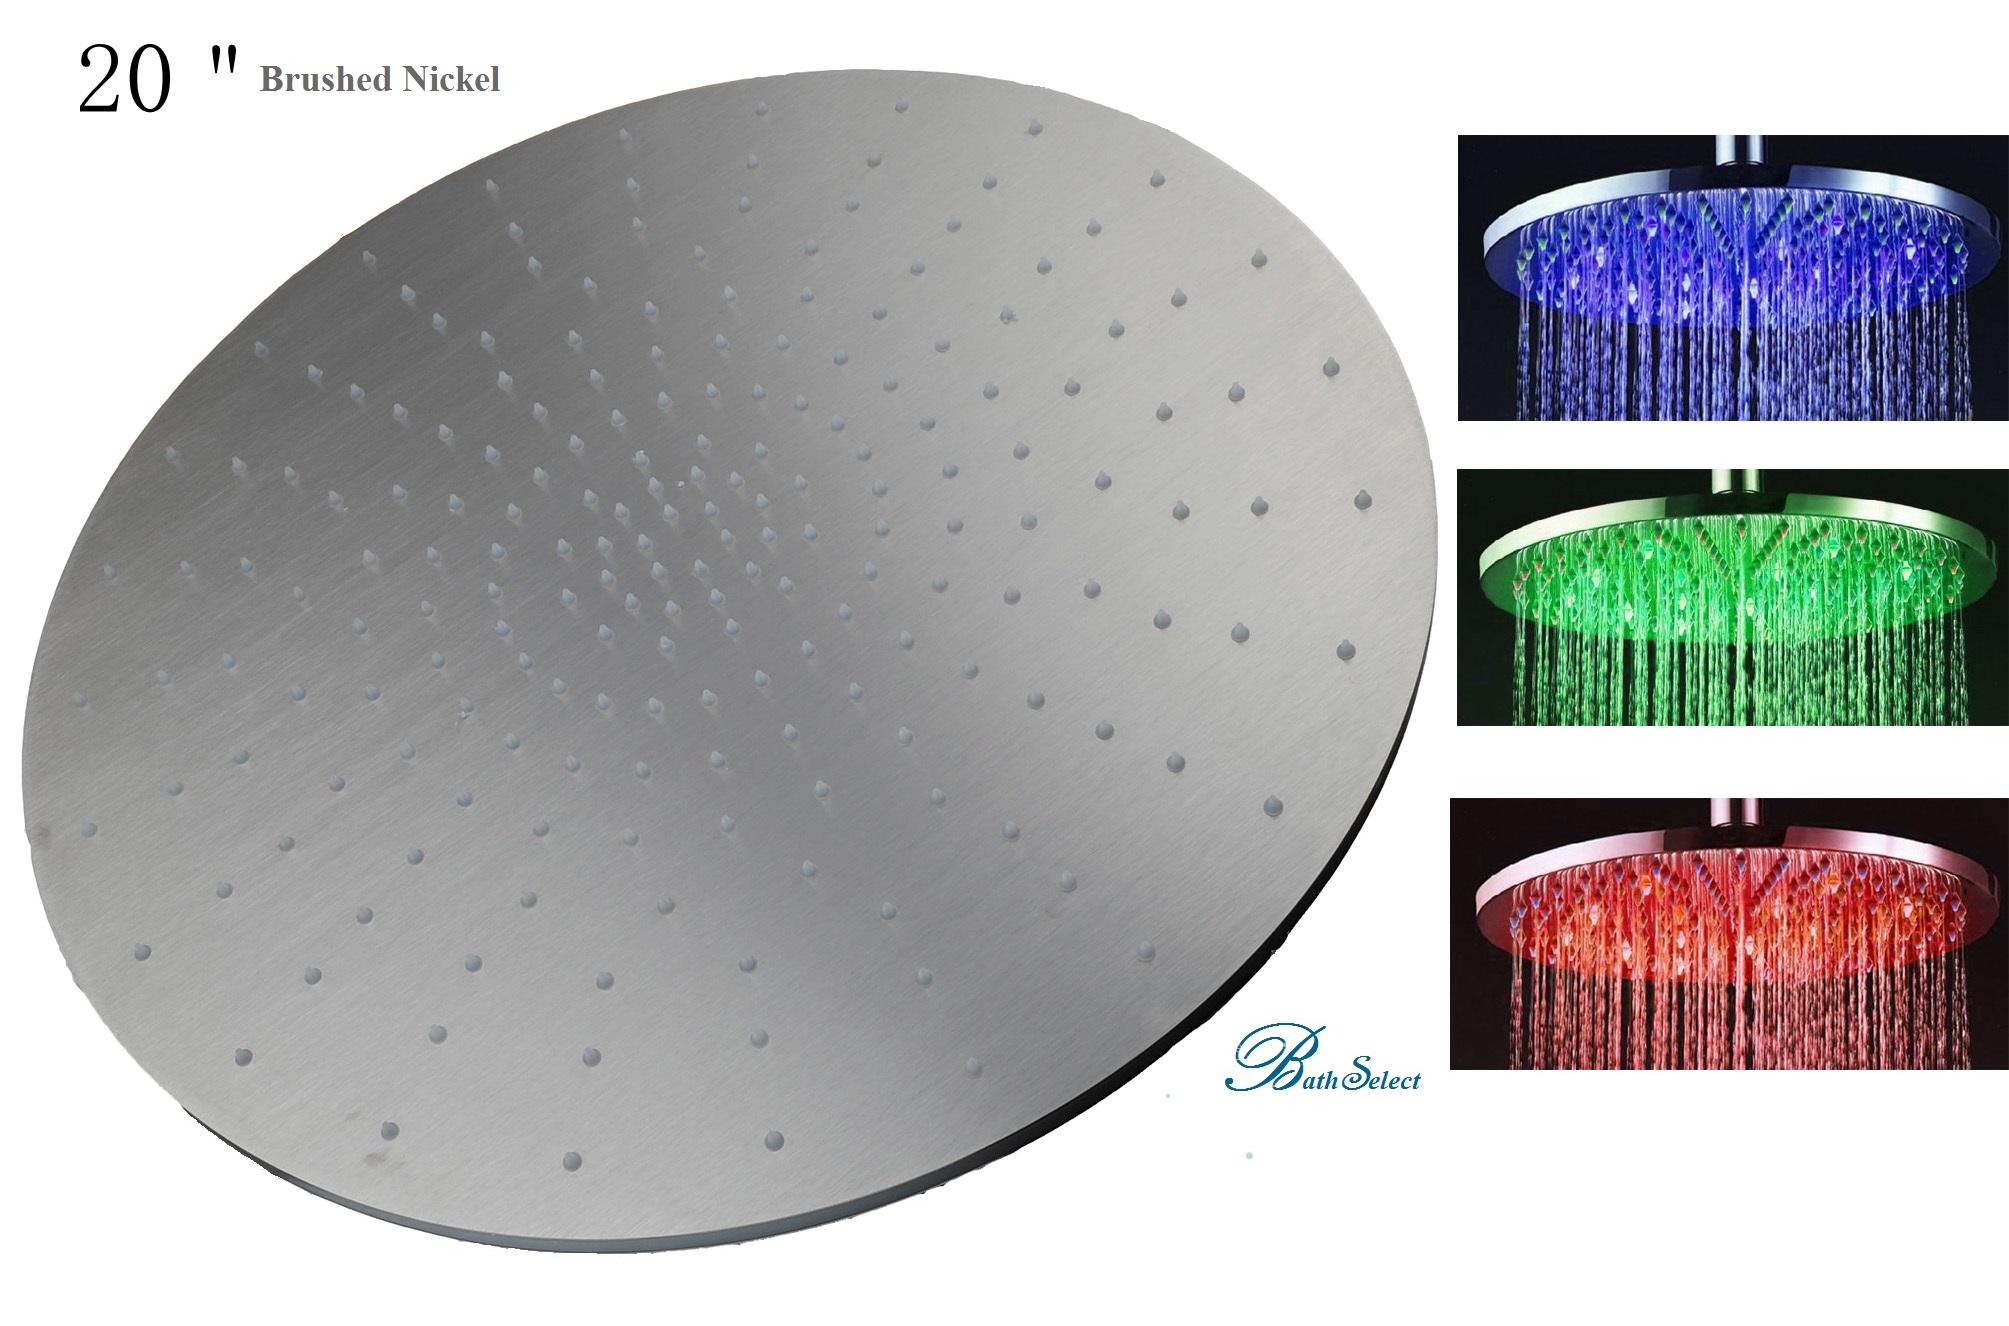 20 Inch Brushed Nickel Led Shower Head